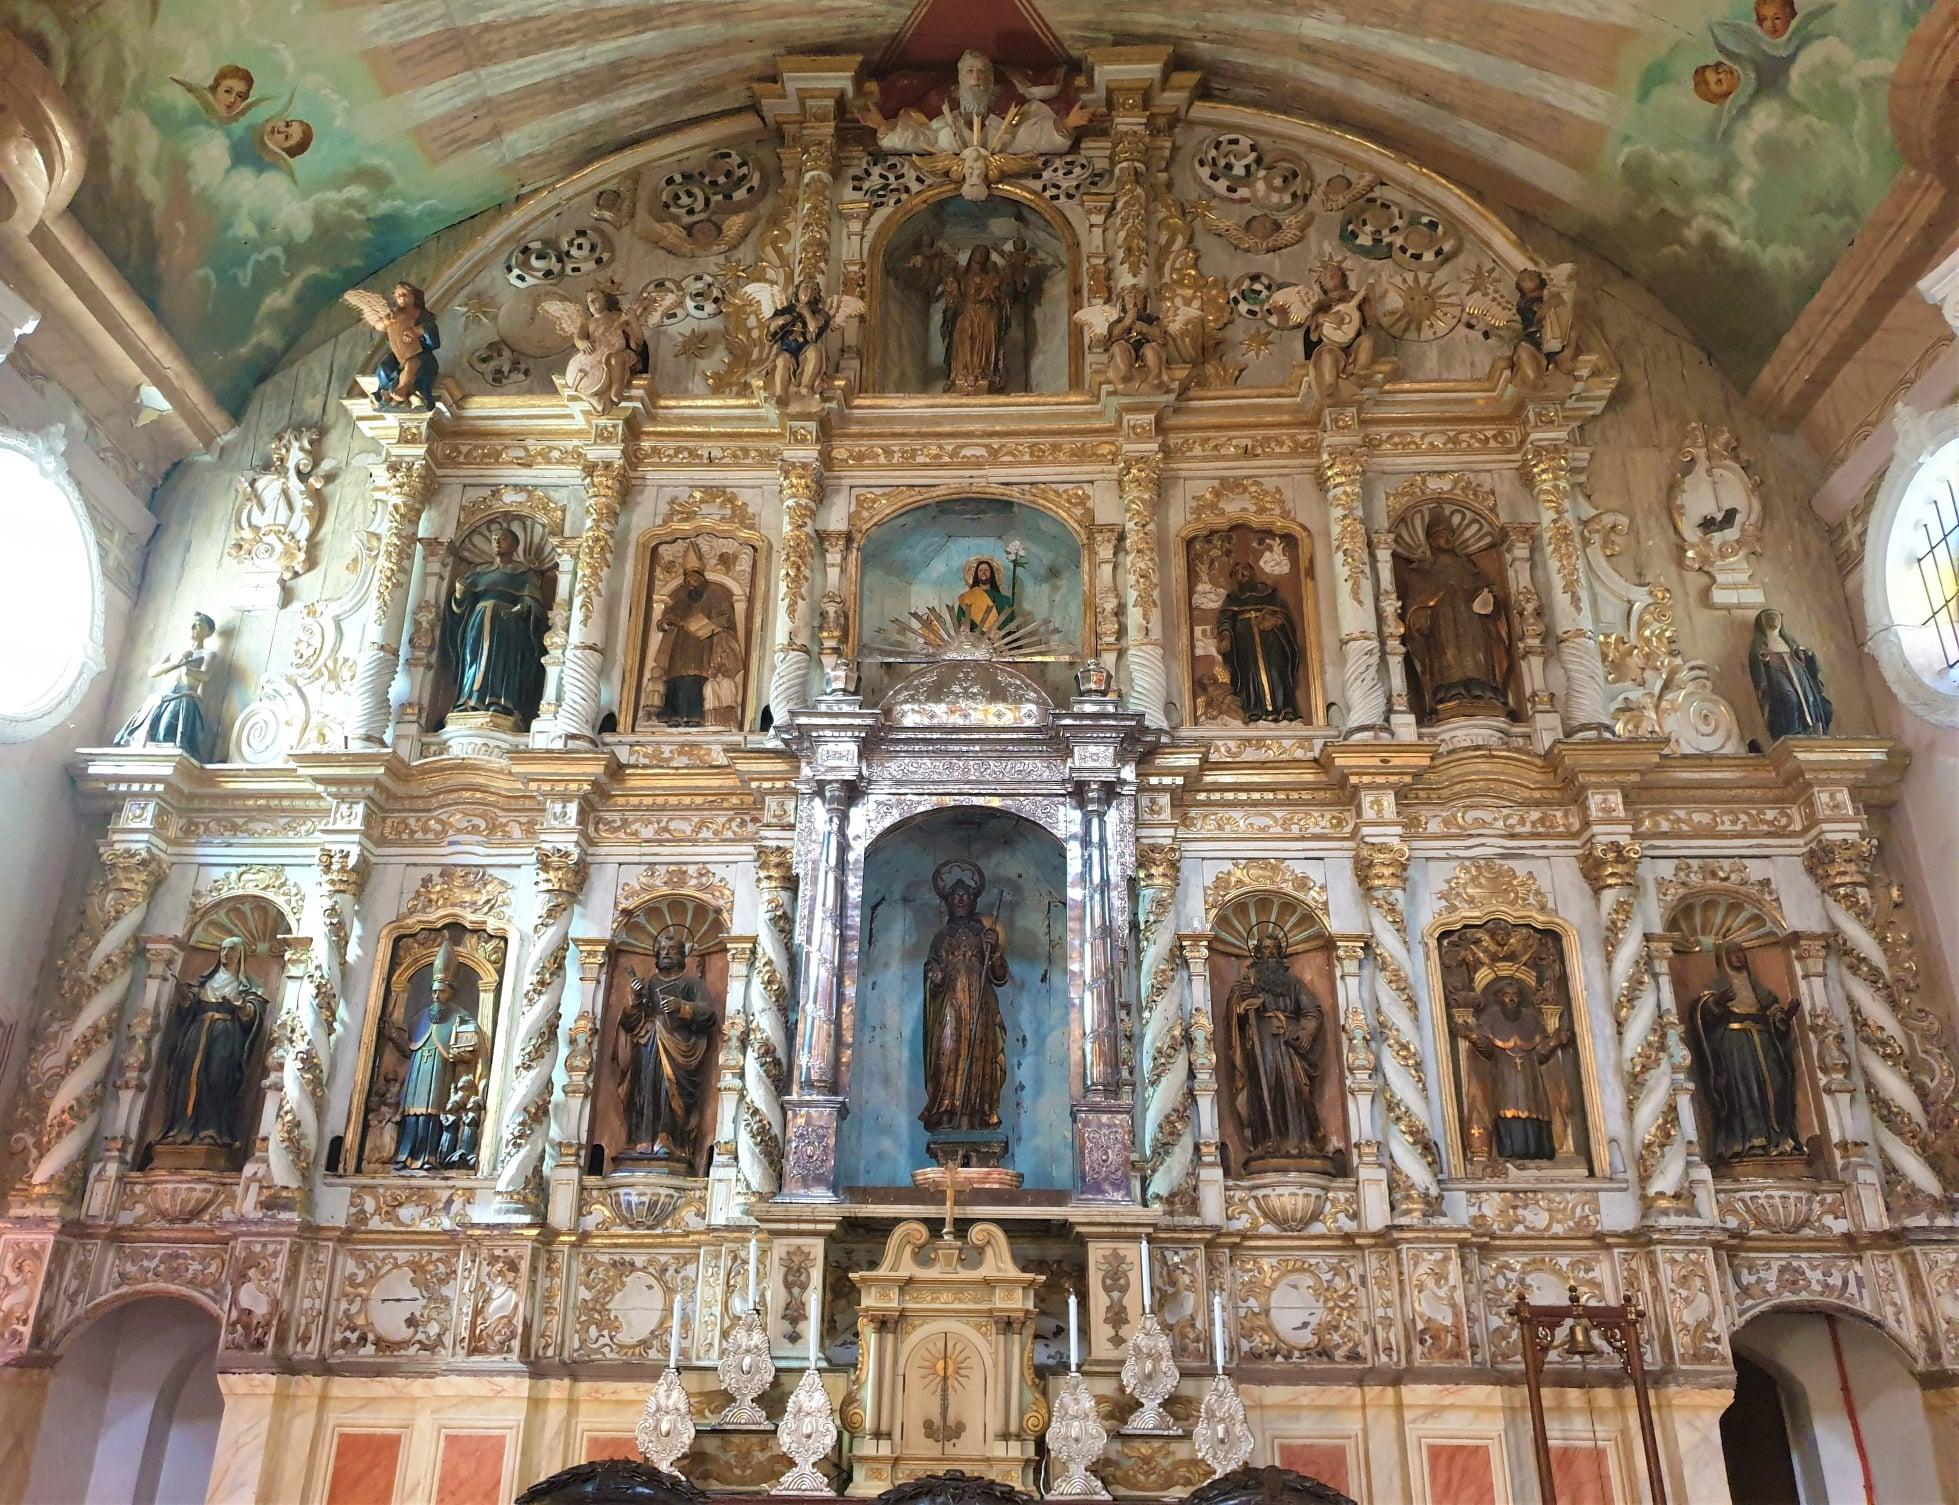 Retablo Mayor or Main Altar of the church Parish Church of Santiago Apostol also known as Betis Church in Guagua, Pampanga